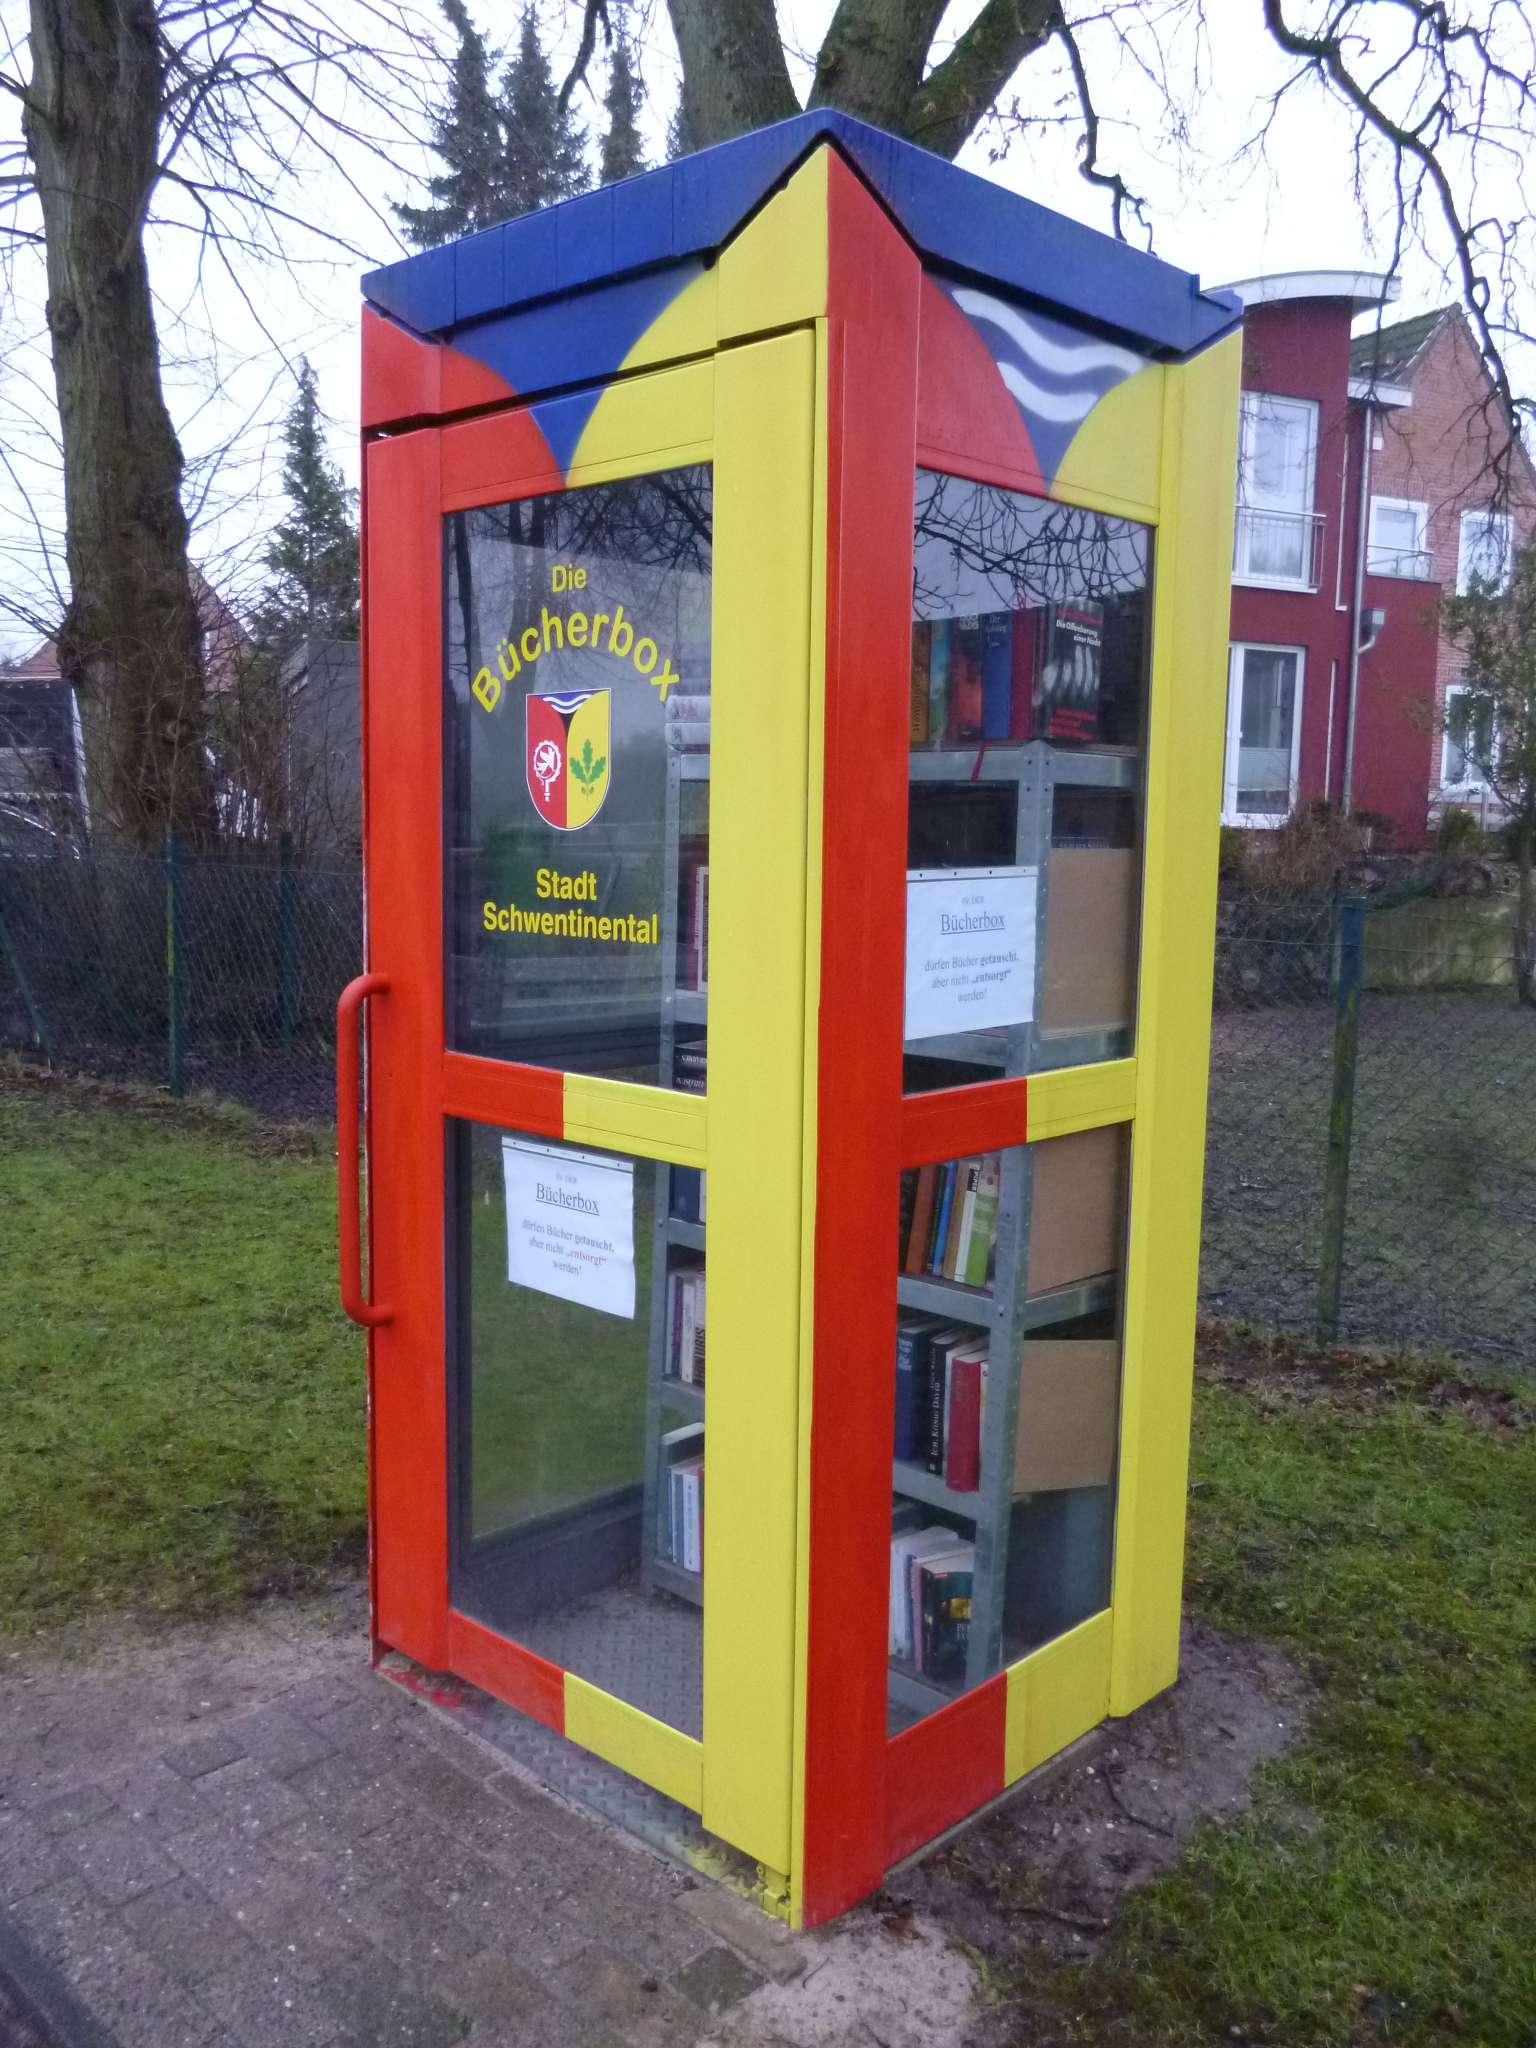 File:Die Bücherbox.jpg - Wikimedia Commons